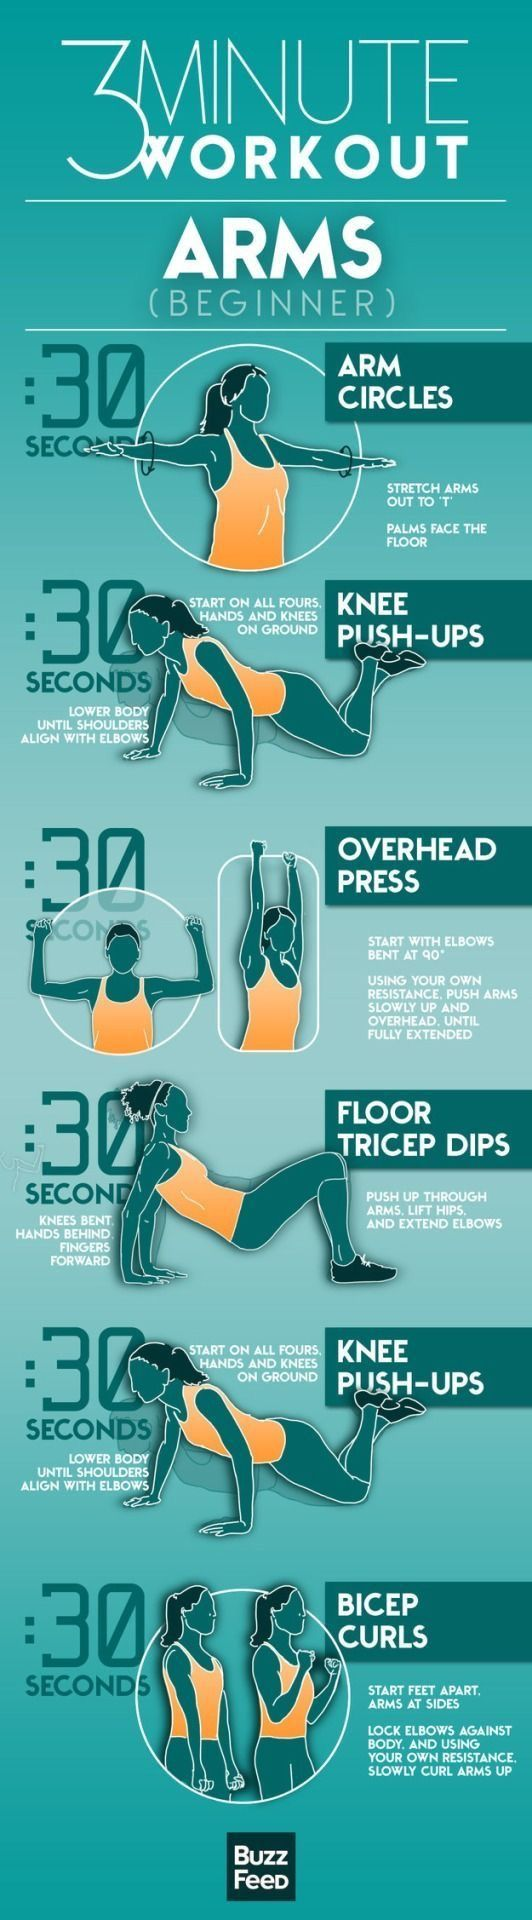 3 minute beginner arm workout